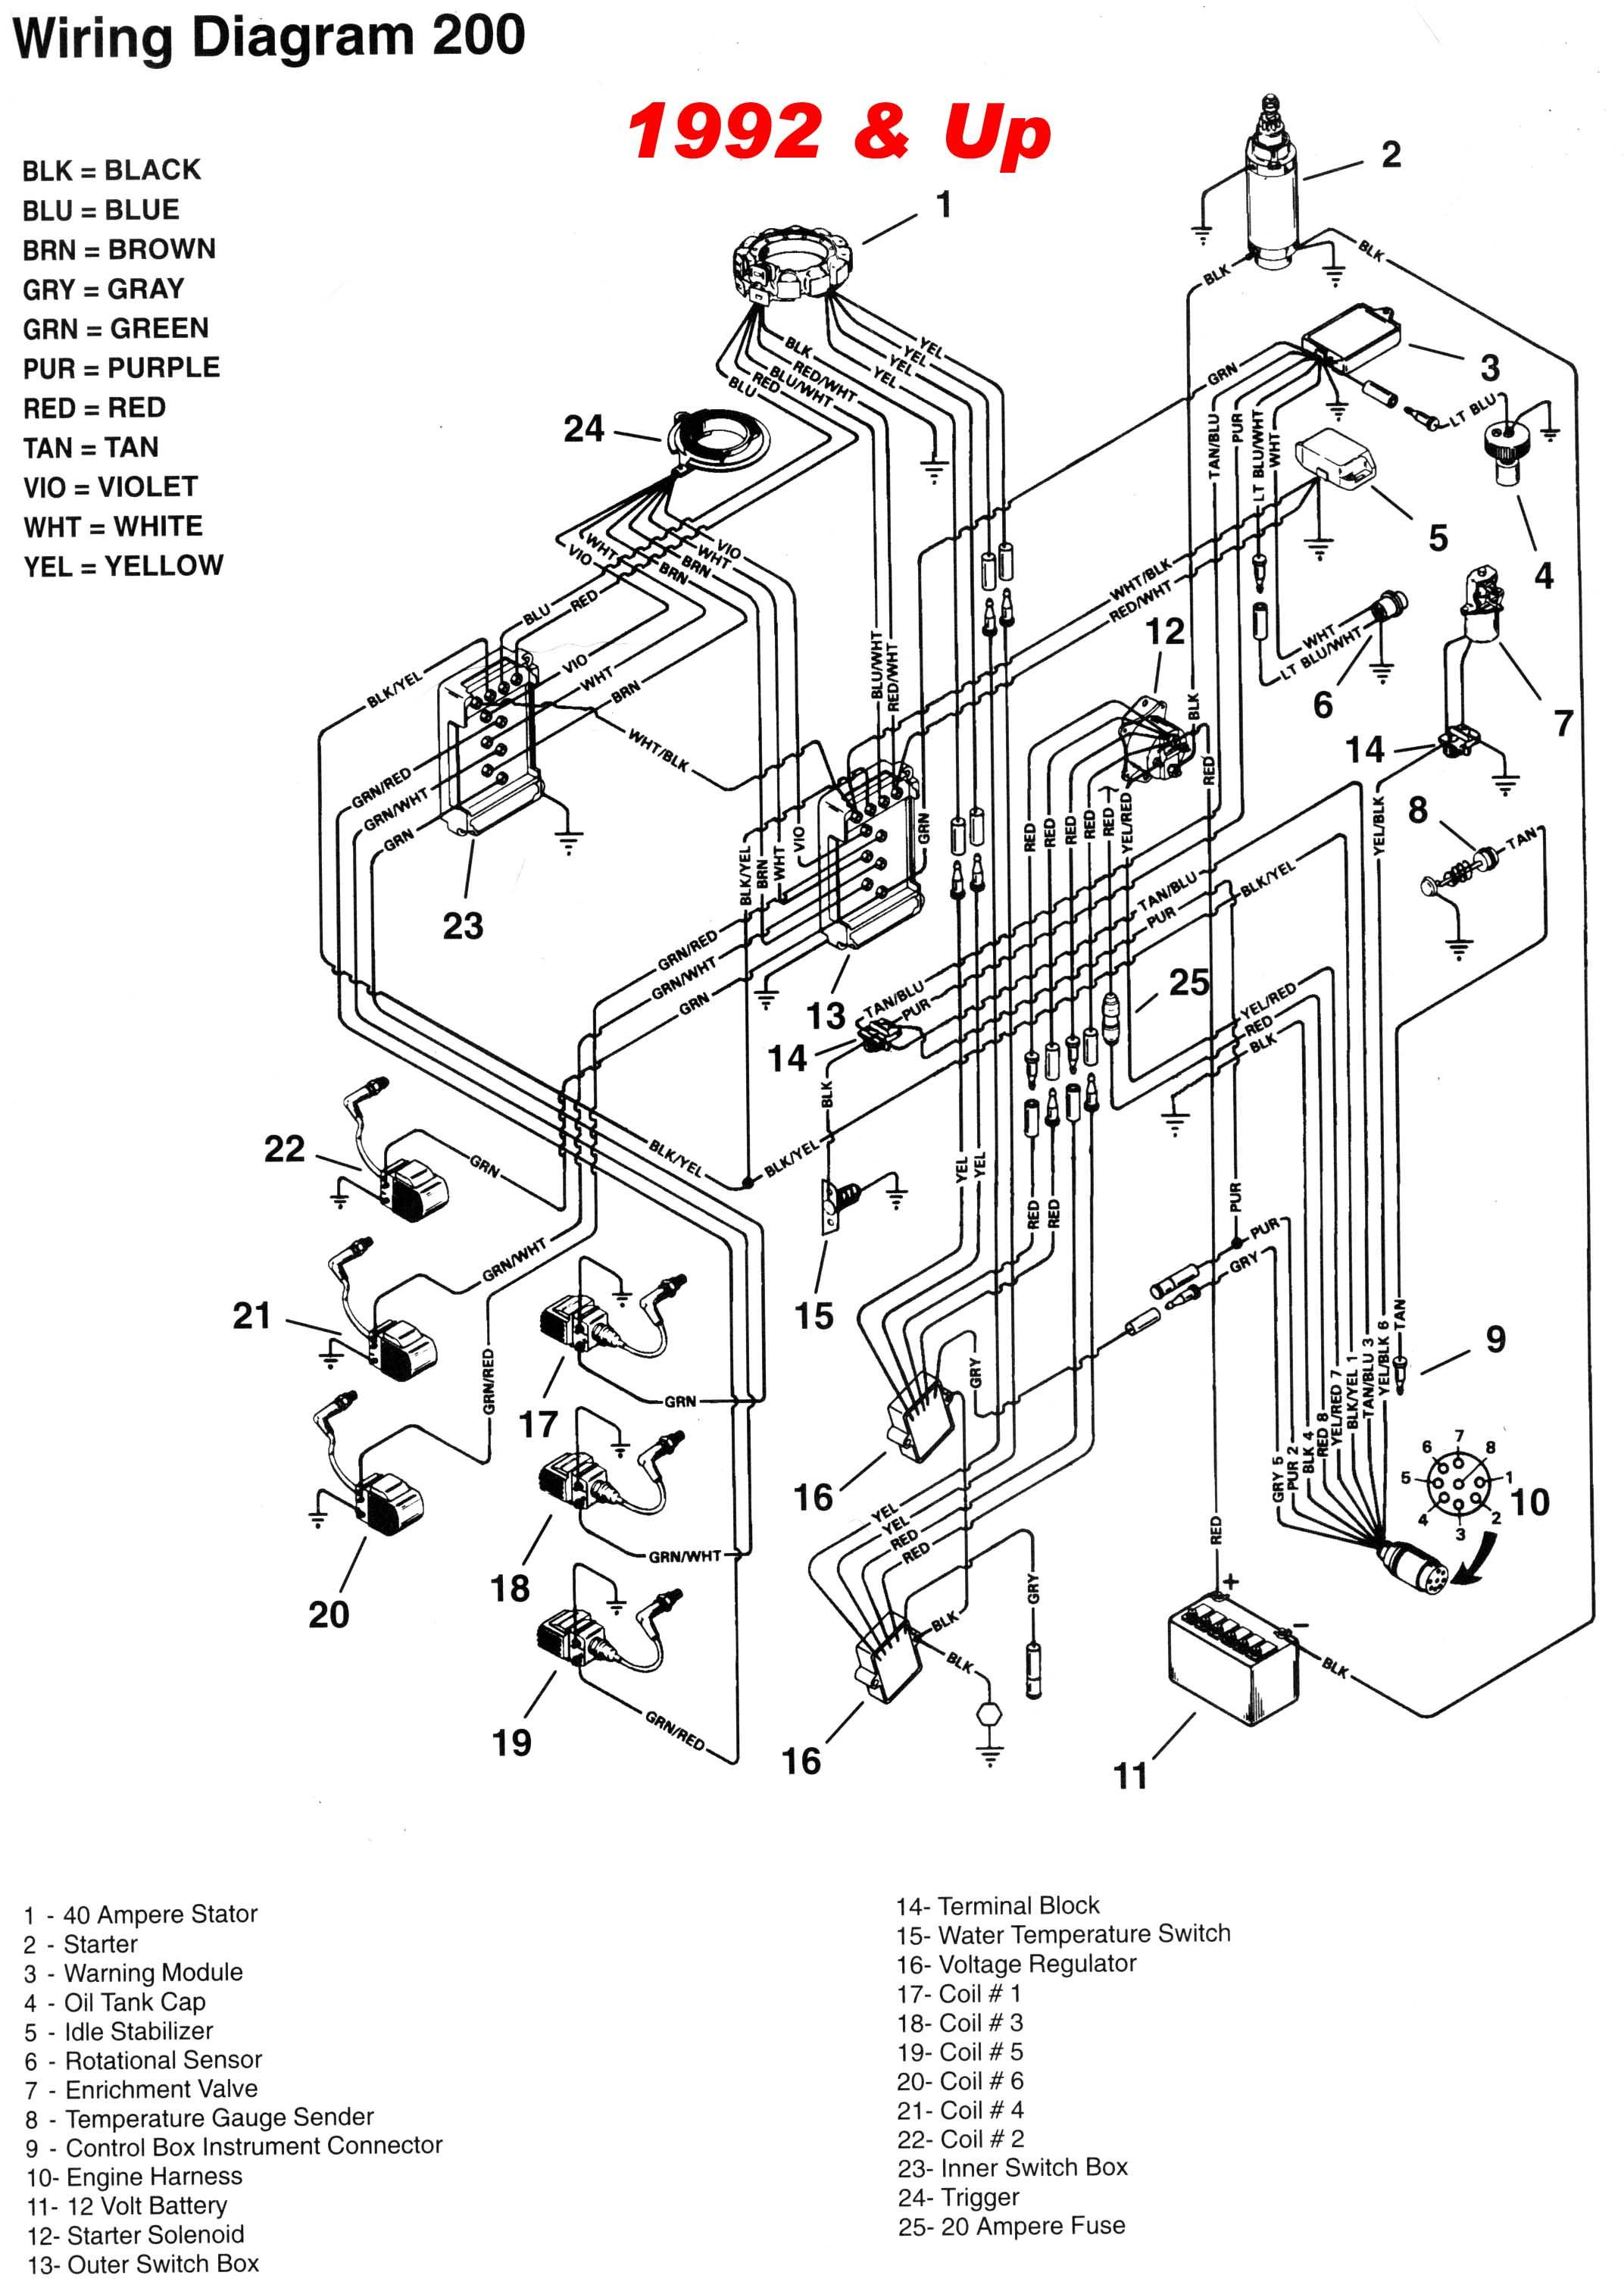 Yamaha Control Box Wiring Diagram - Today Wiring Diagram - Yamaha Outboard Ignition Switch Wiring Diagram